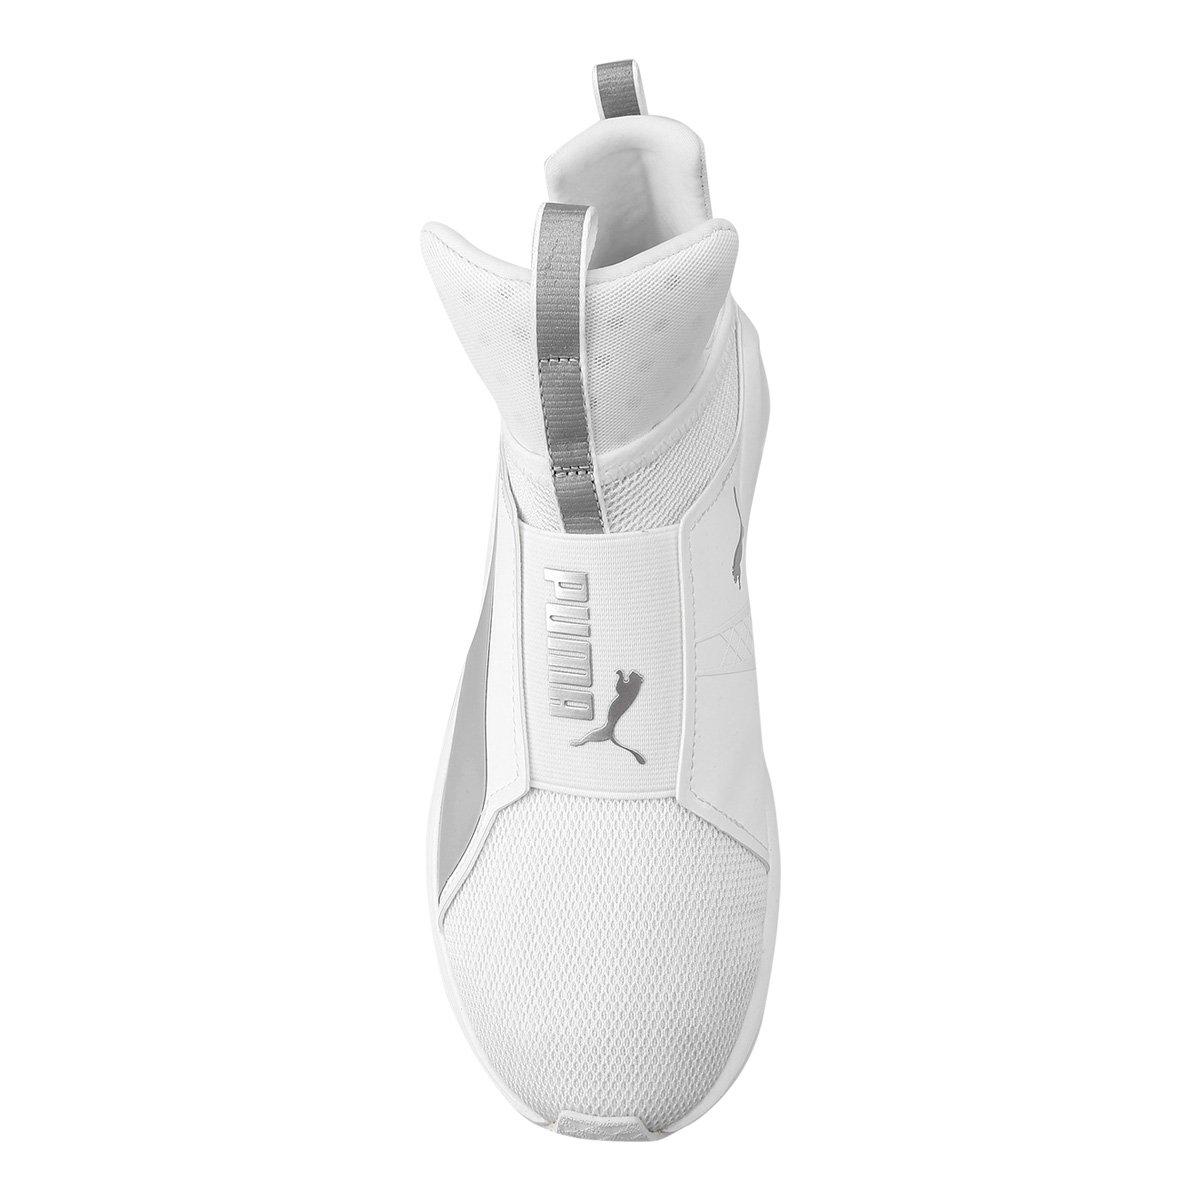 0d07679294 Tênis Puma Fierce Core Feminino - Compre Agora